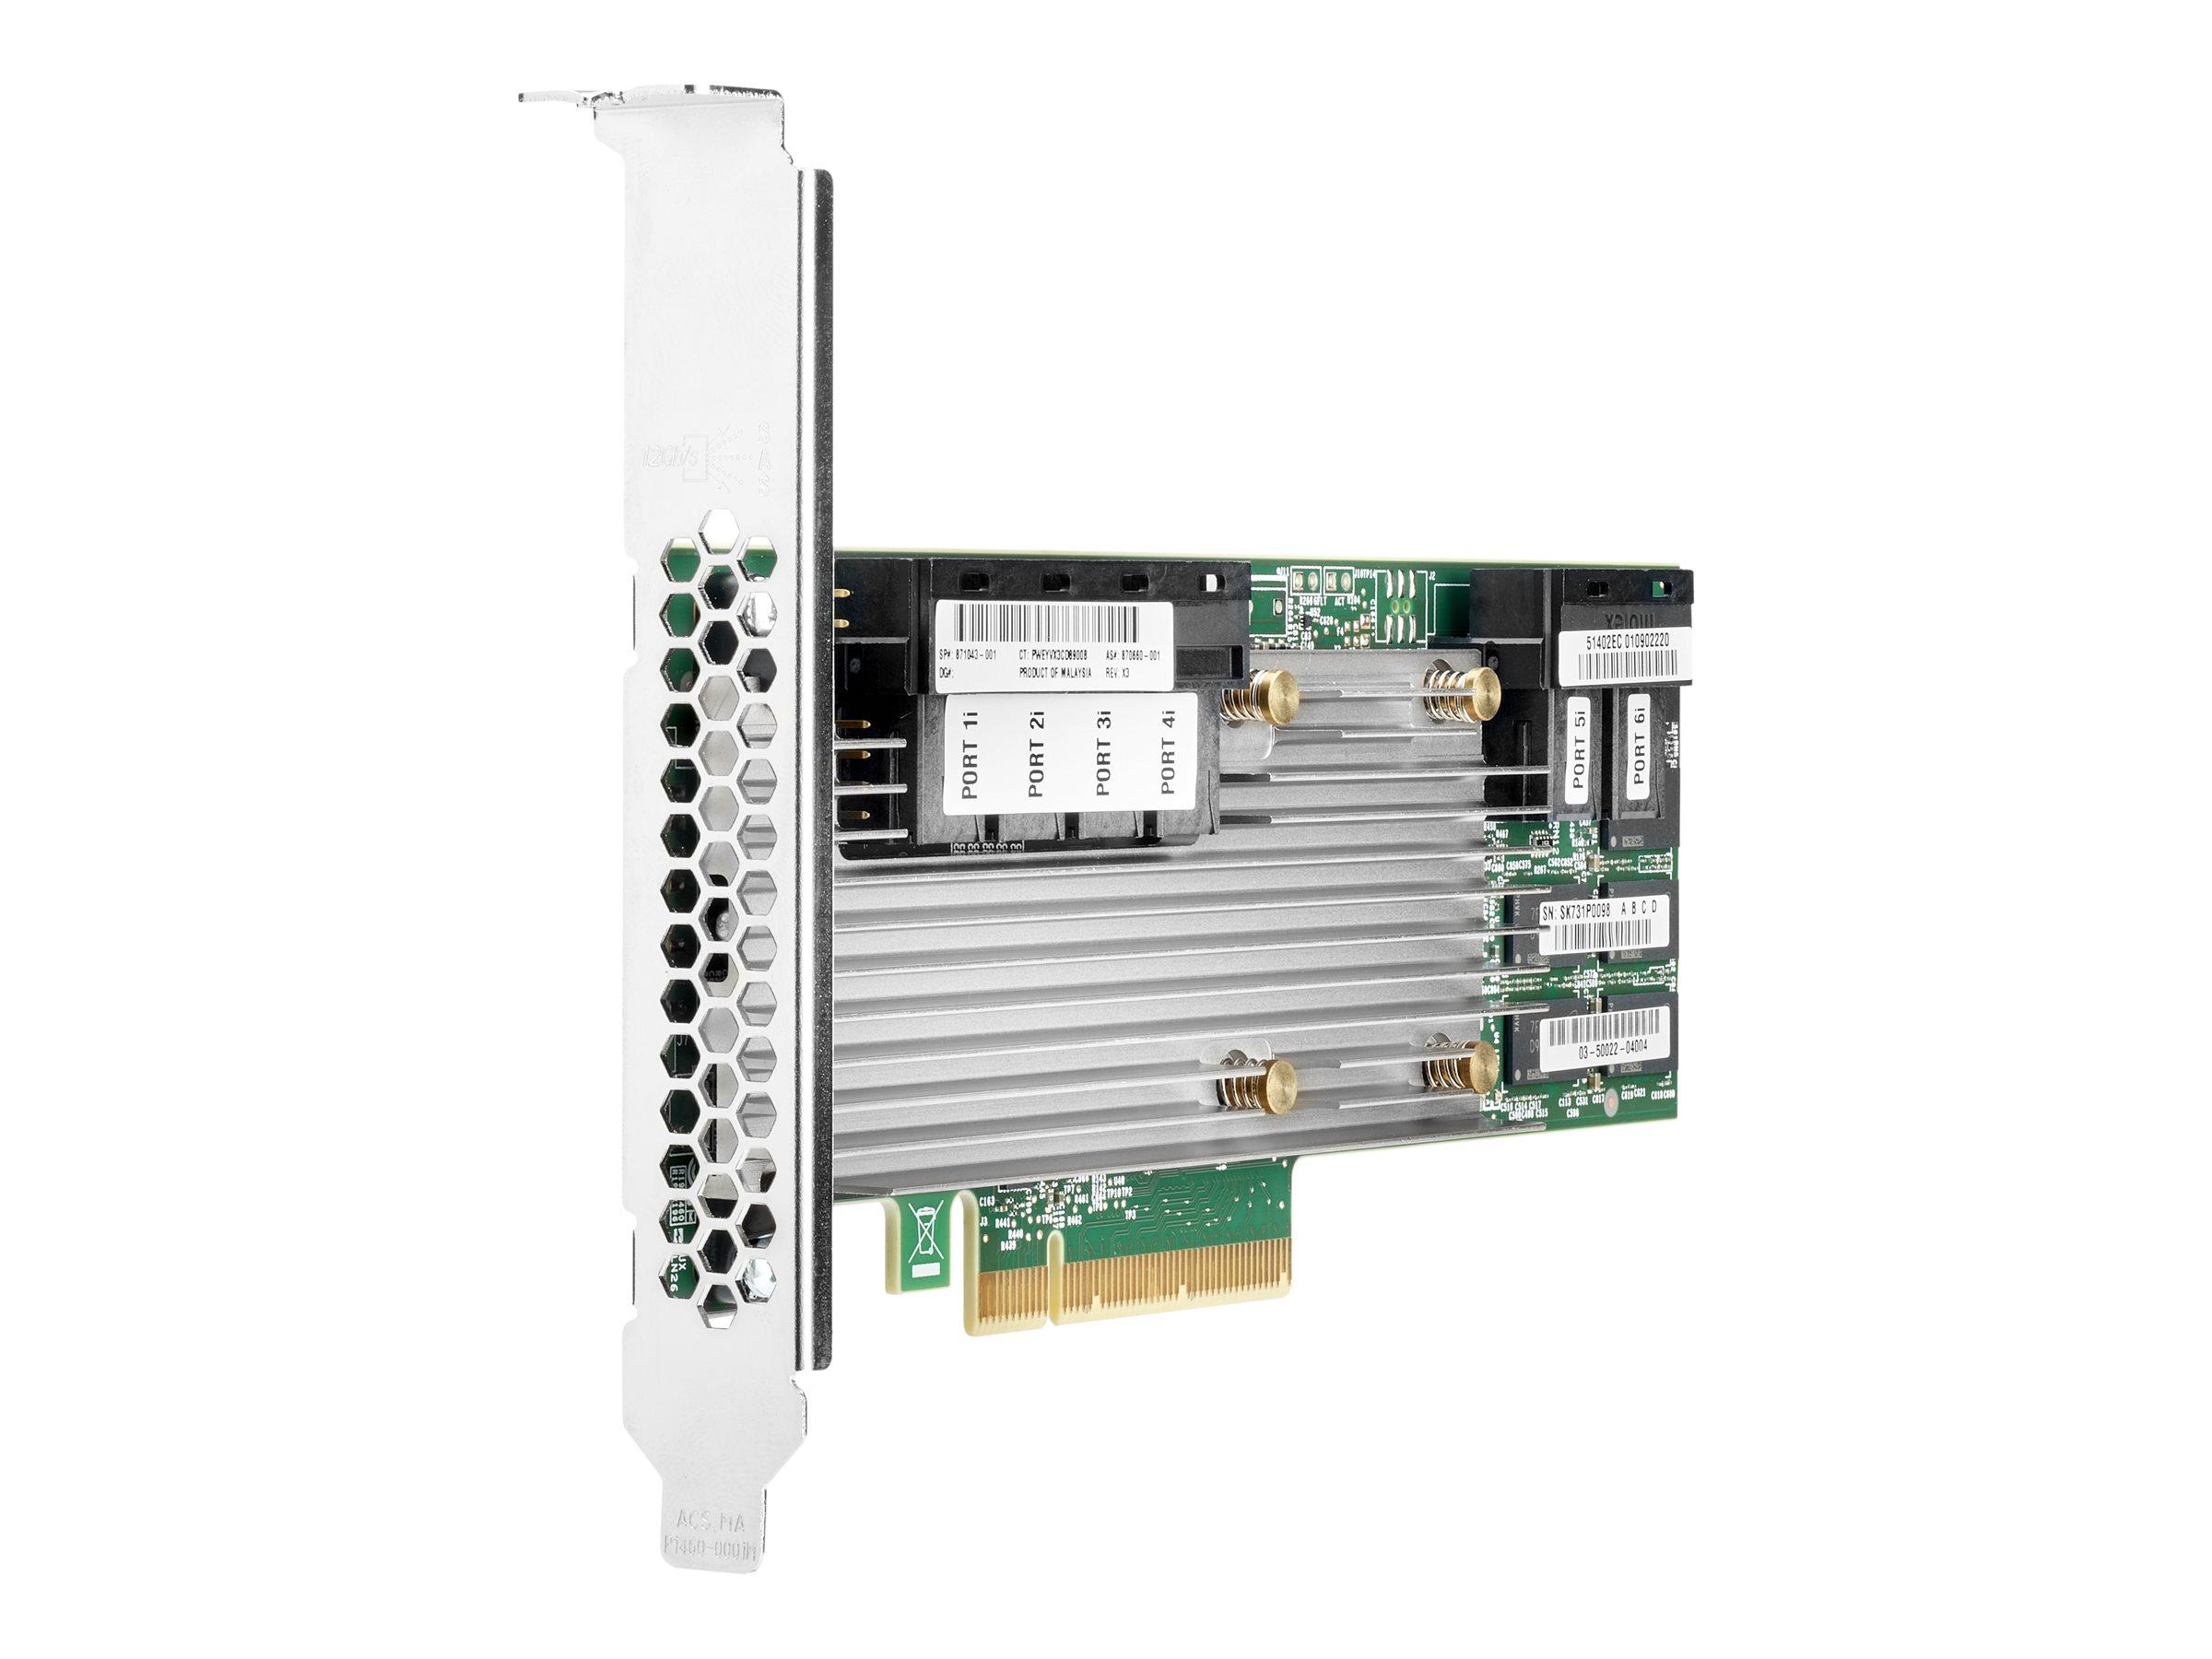 HPE Smart Array P824i-p MR Gen10 - Speichercontroller (RAID) - 24 Sender/Kanal - SATA 6Gb/s / SAS 12Gb/s - 12 Gbit/s - RAID 0, 1